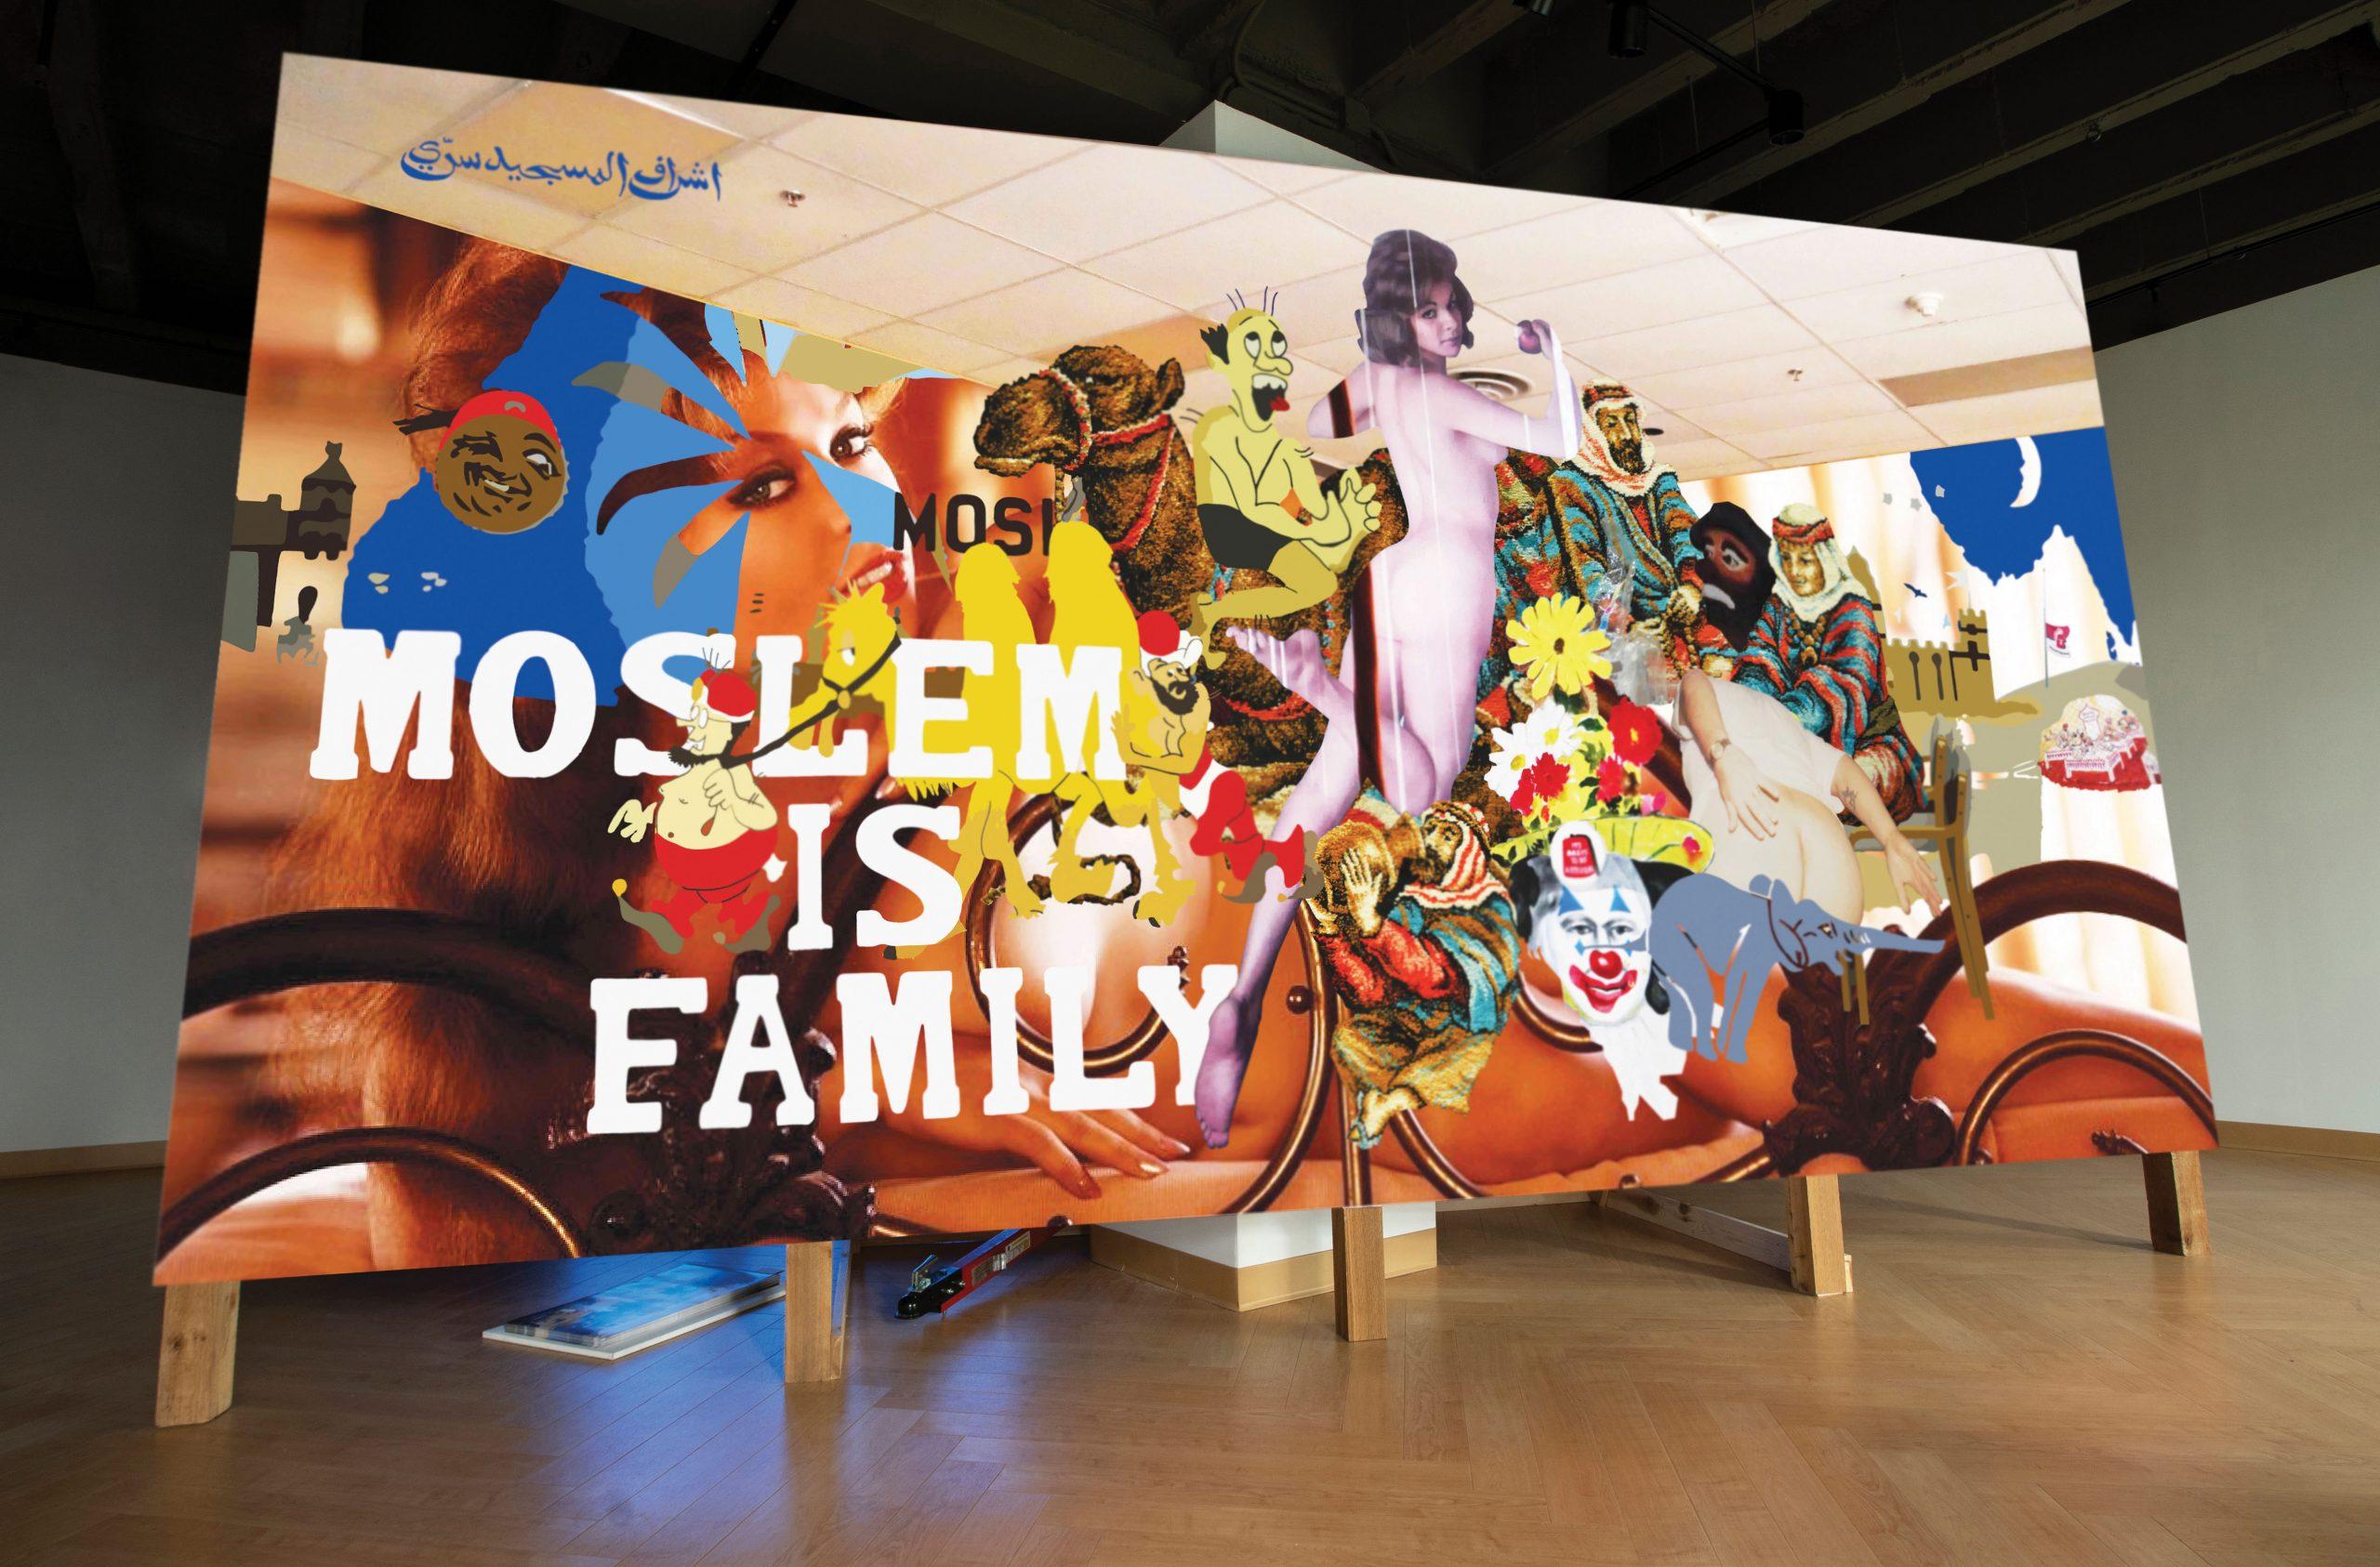 Moslem is Family, 2019, Vinyl billboard, 17 x 9 ft